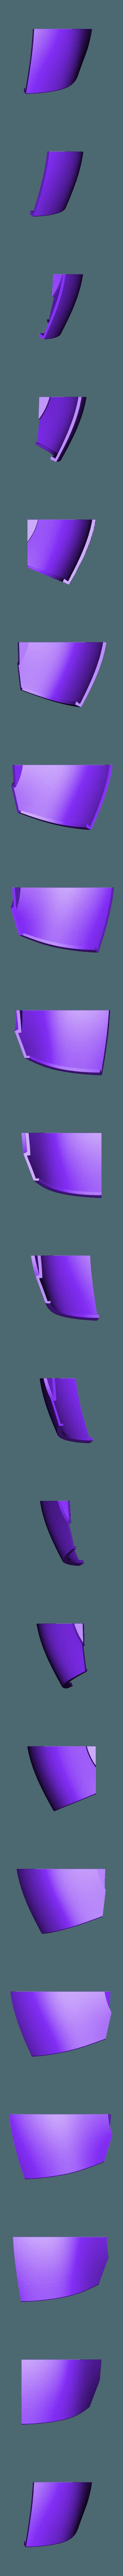 part 14.stl Download STL file Deathstroke Injustice Helmet • 3D printable model, VillainousPropShop